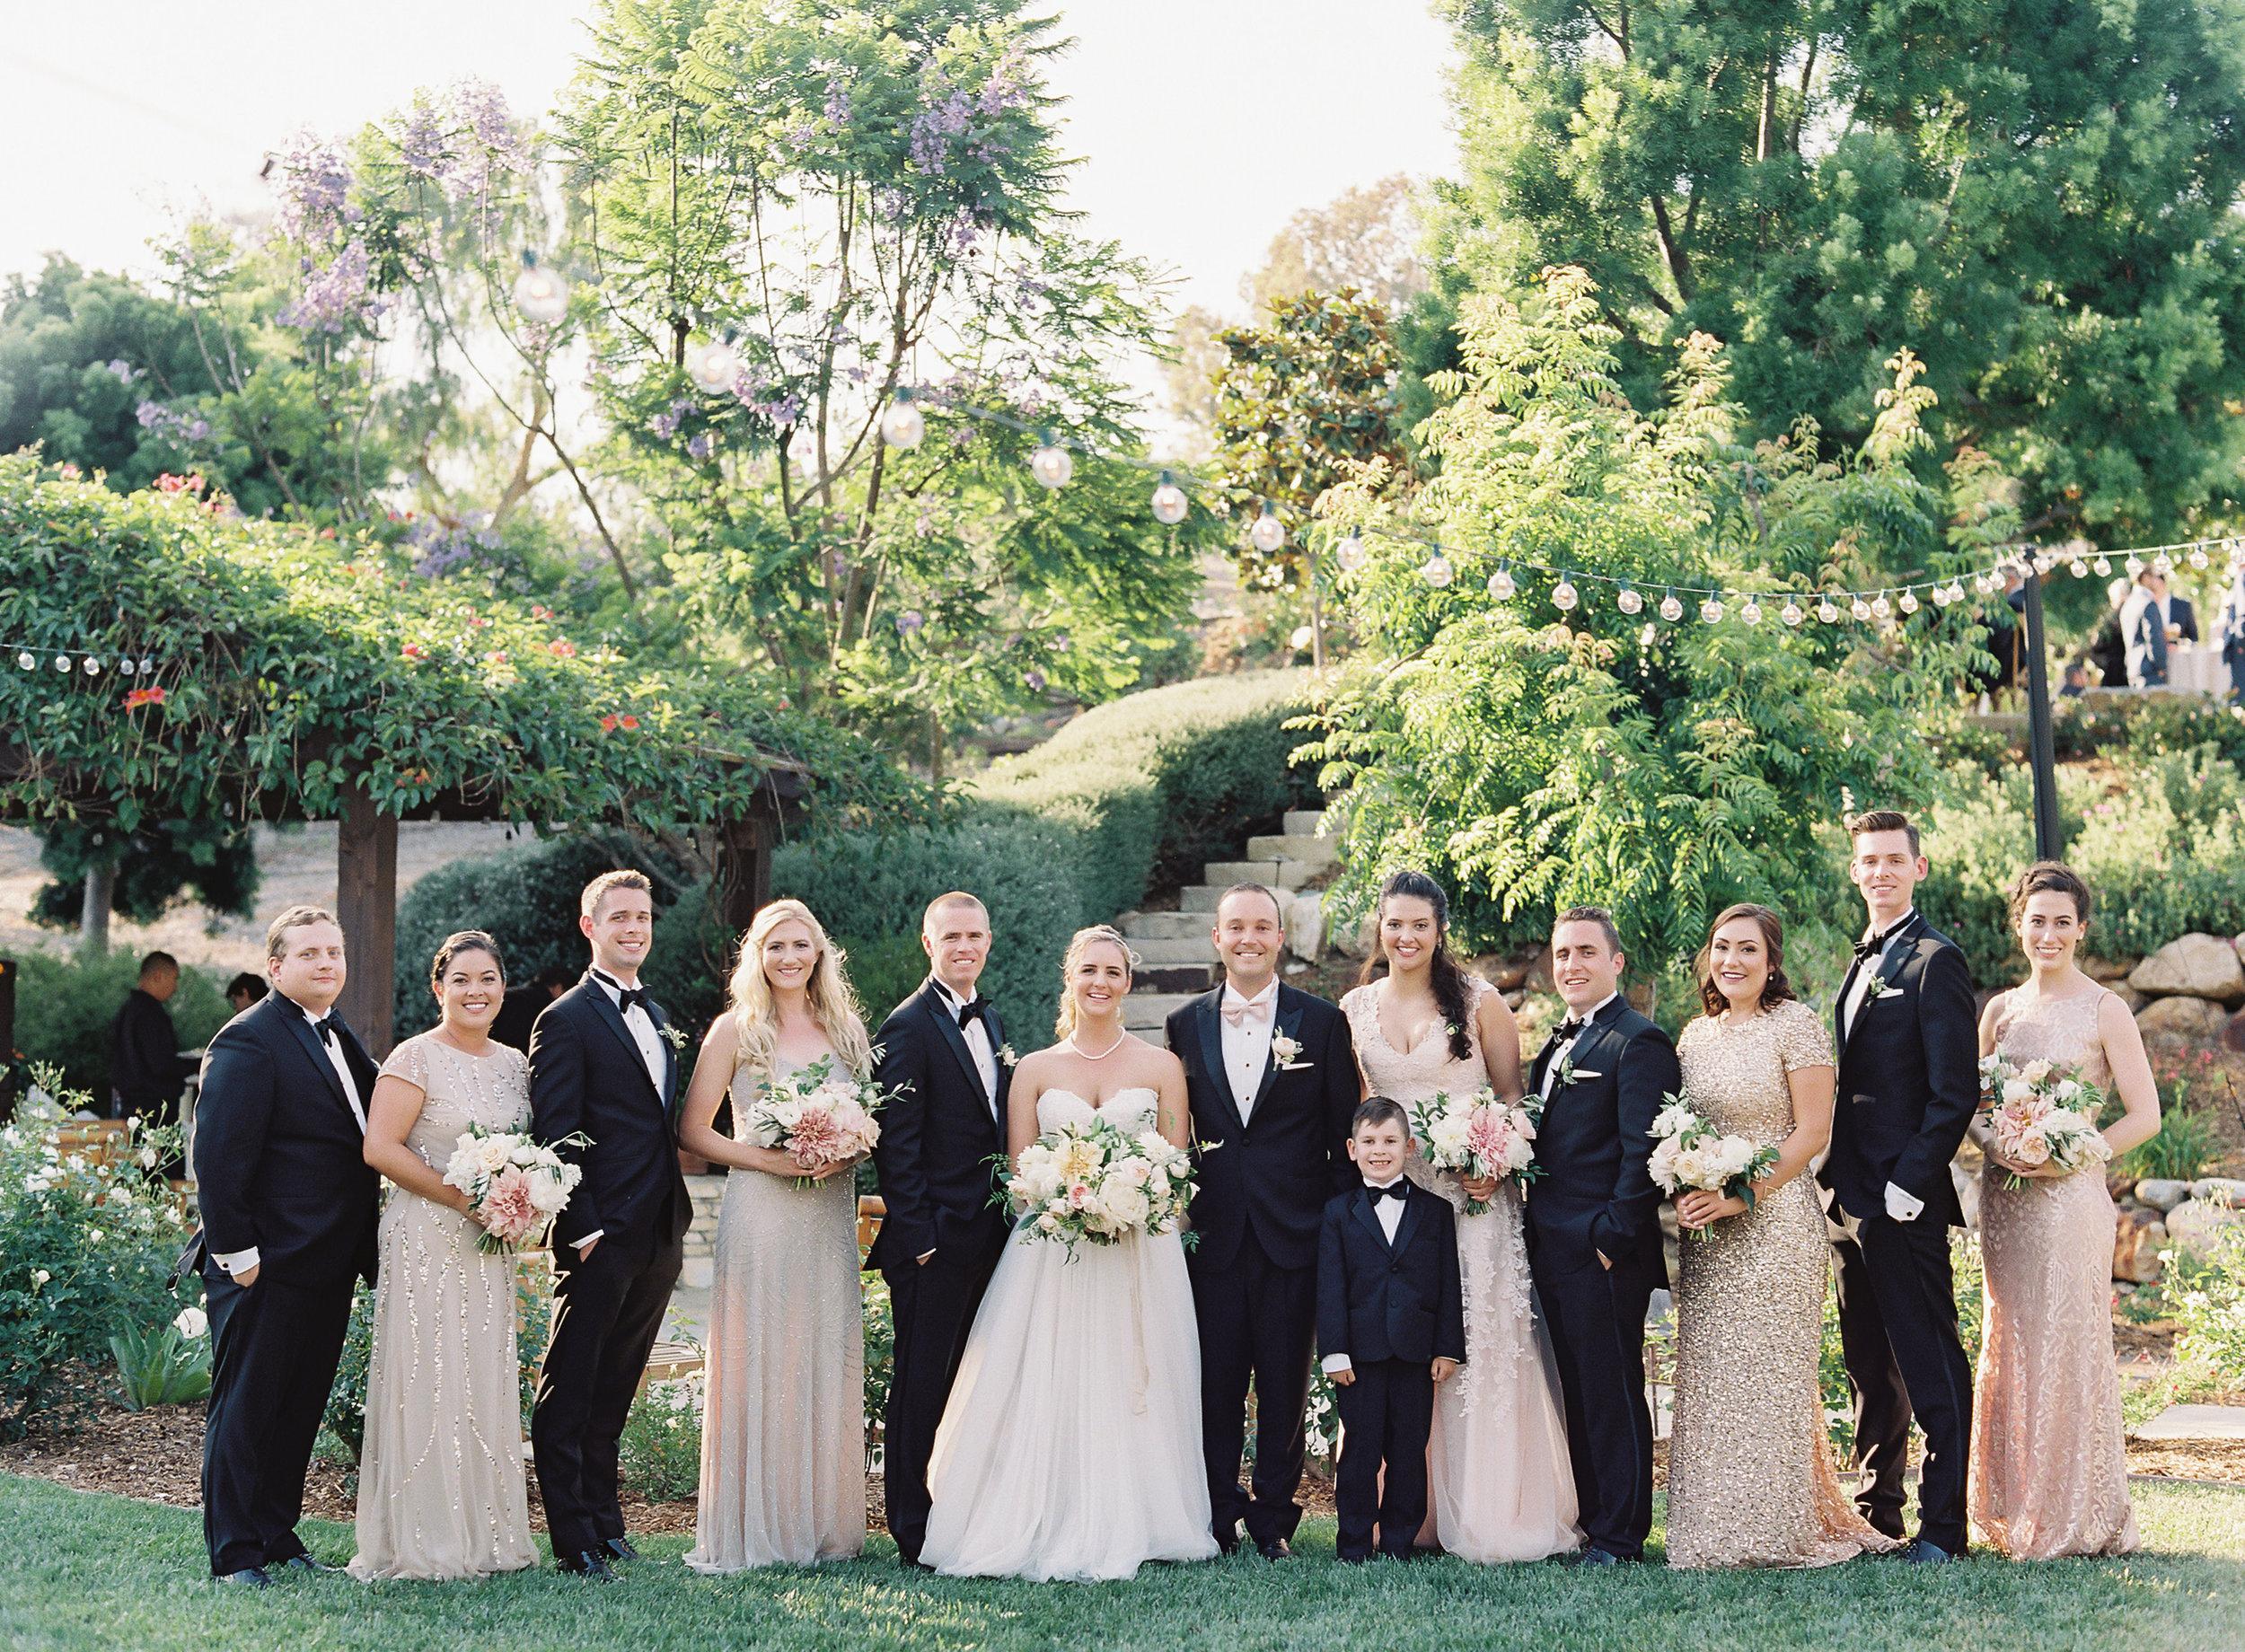 Braden-Hannah-Married-445.jpg